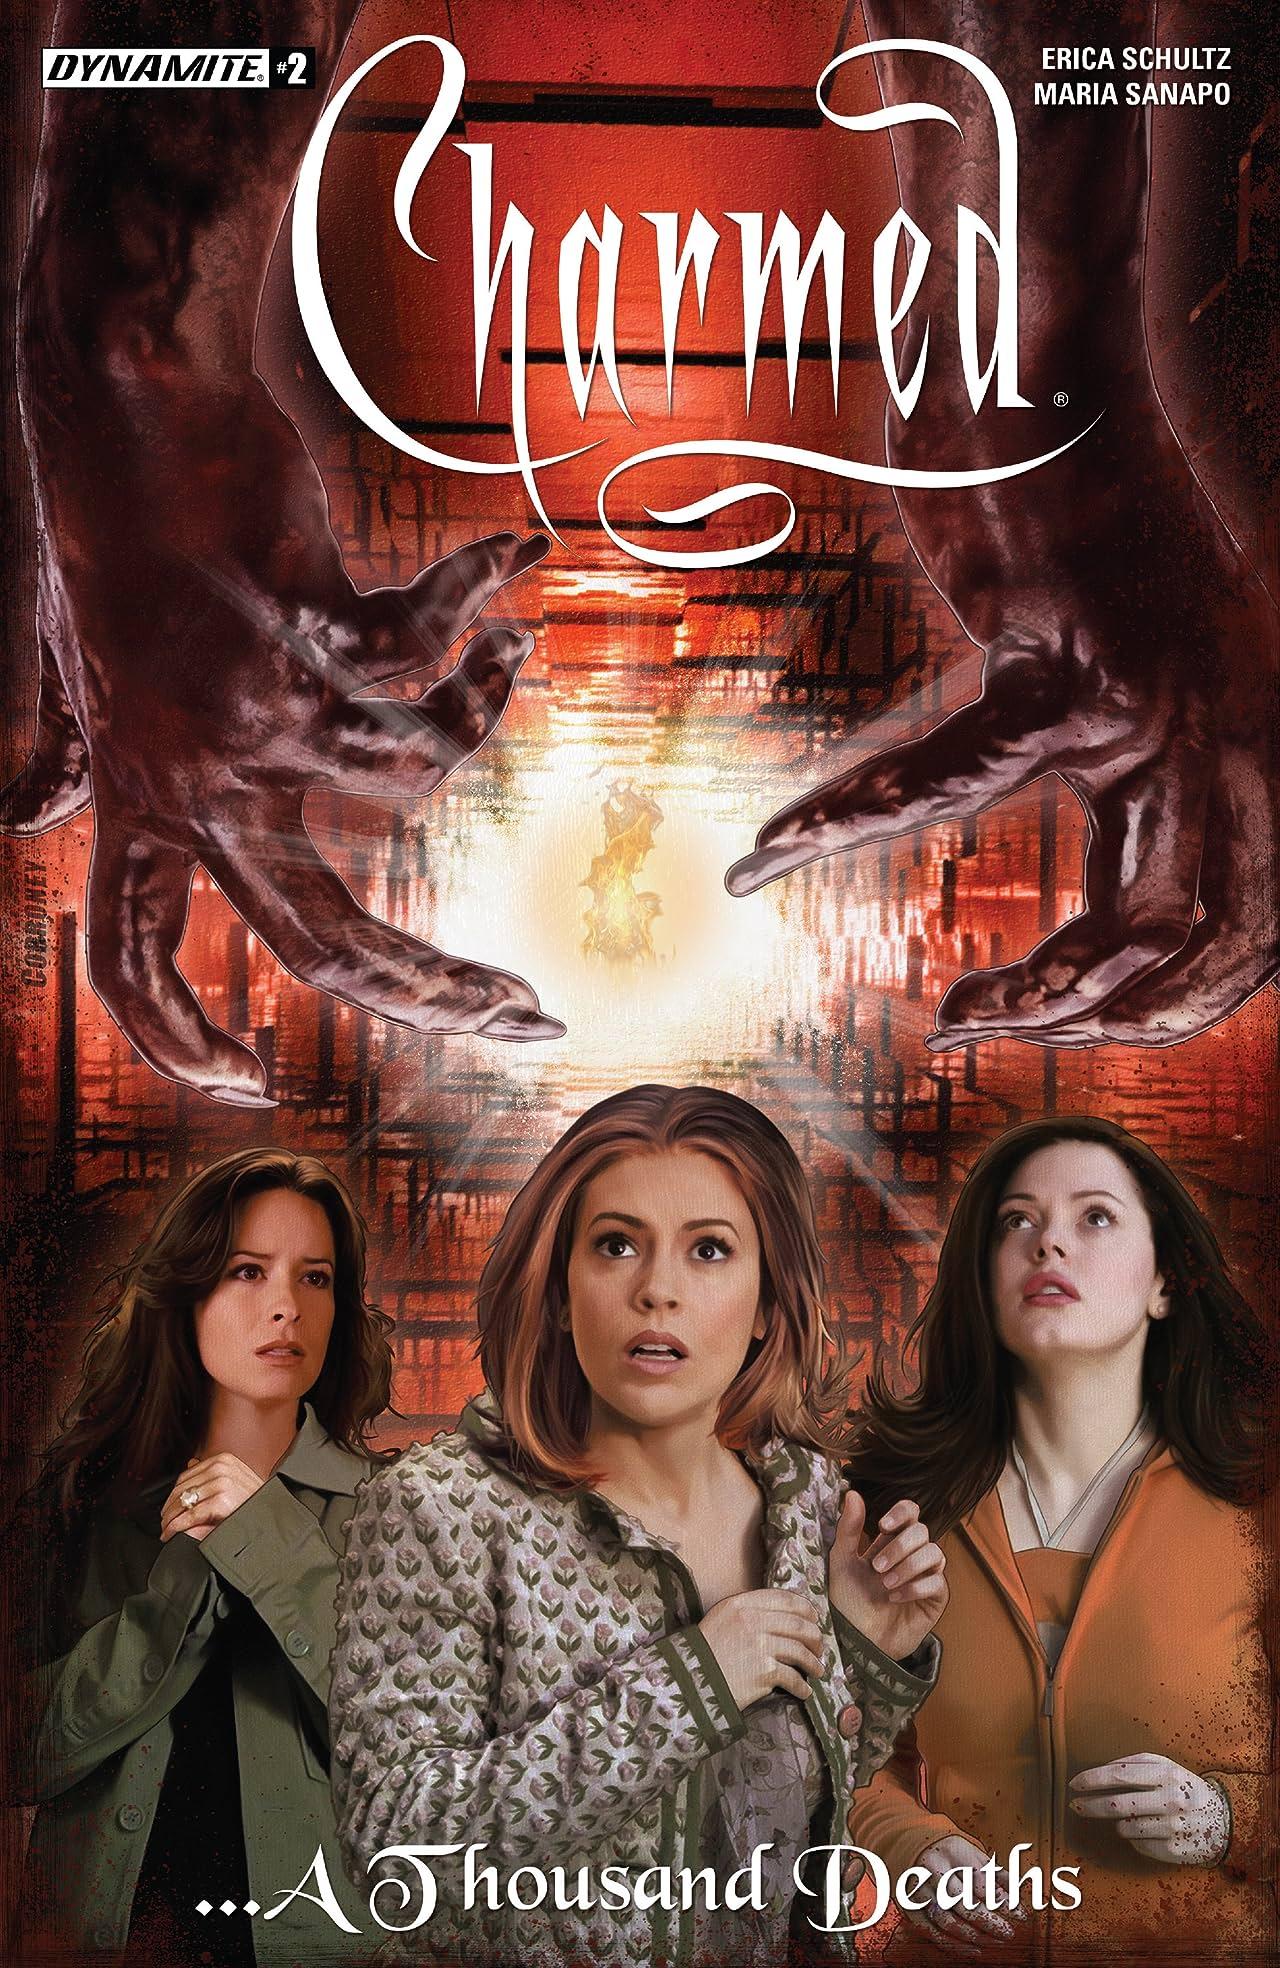 Charmed #2